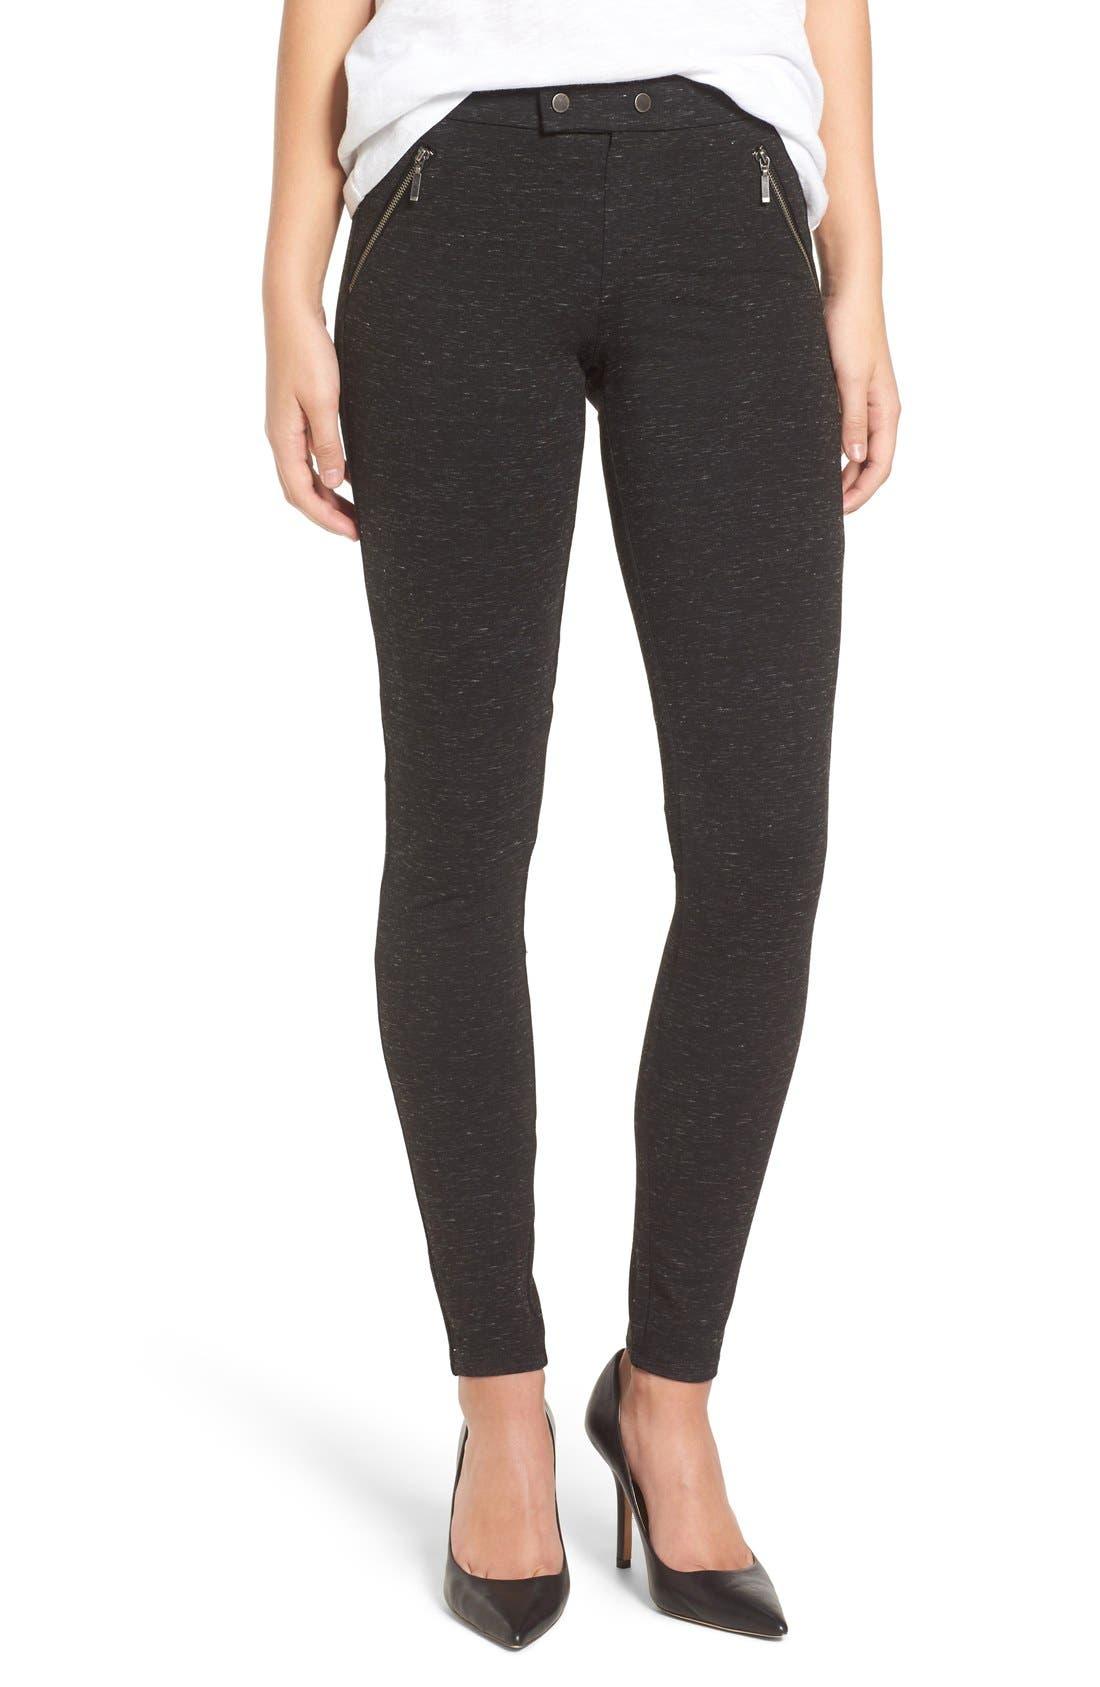 Alternate Image 1 Selected - Wit & Wisdom Ponte Knit Pants (Regular & Petite) (Nordstrom Exclusive)